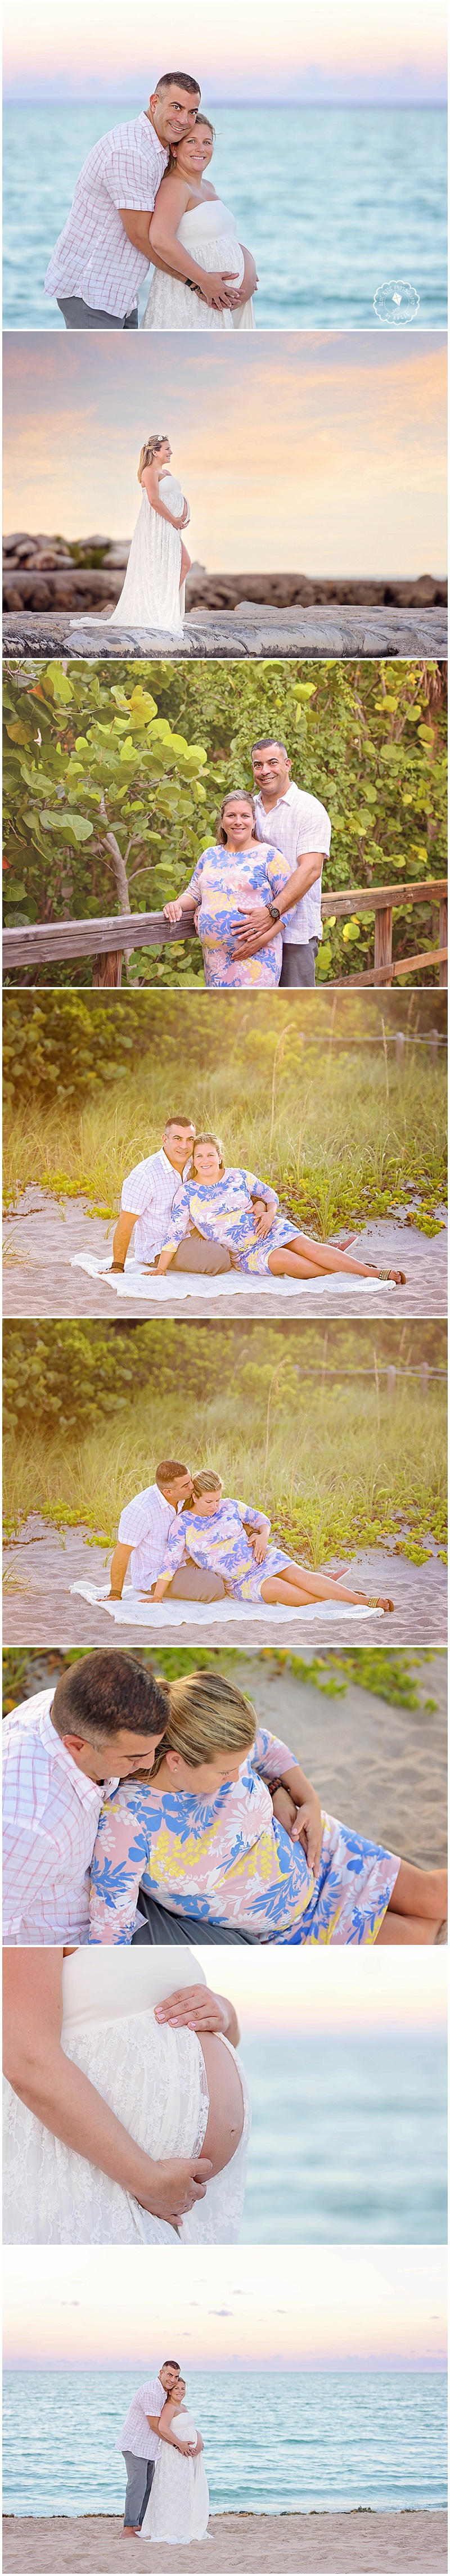 Beach Maternity Session Boca Raton FL. Maternity Photography. Boca Raton Newborn Photographer, Coral Springs, Delray, Parkland, Boynton Beach, Wellington Newborn Photographer.